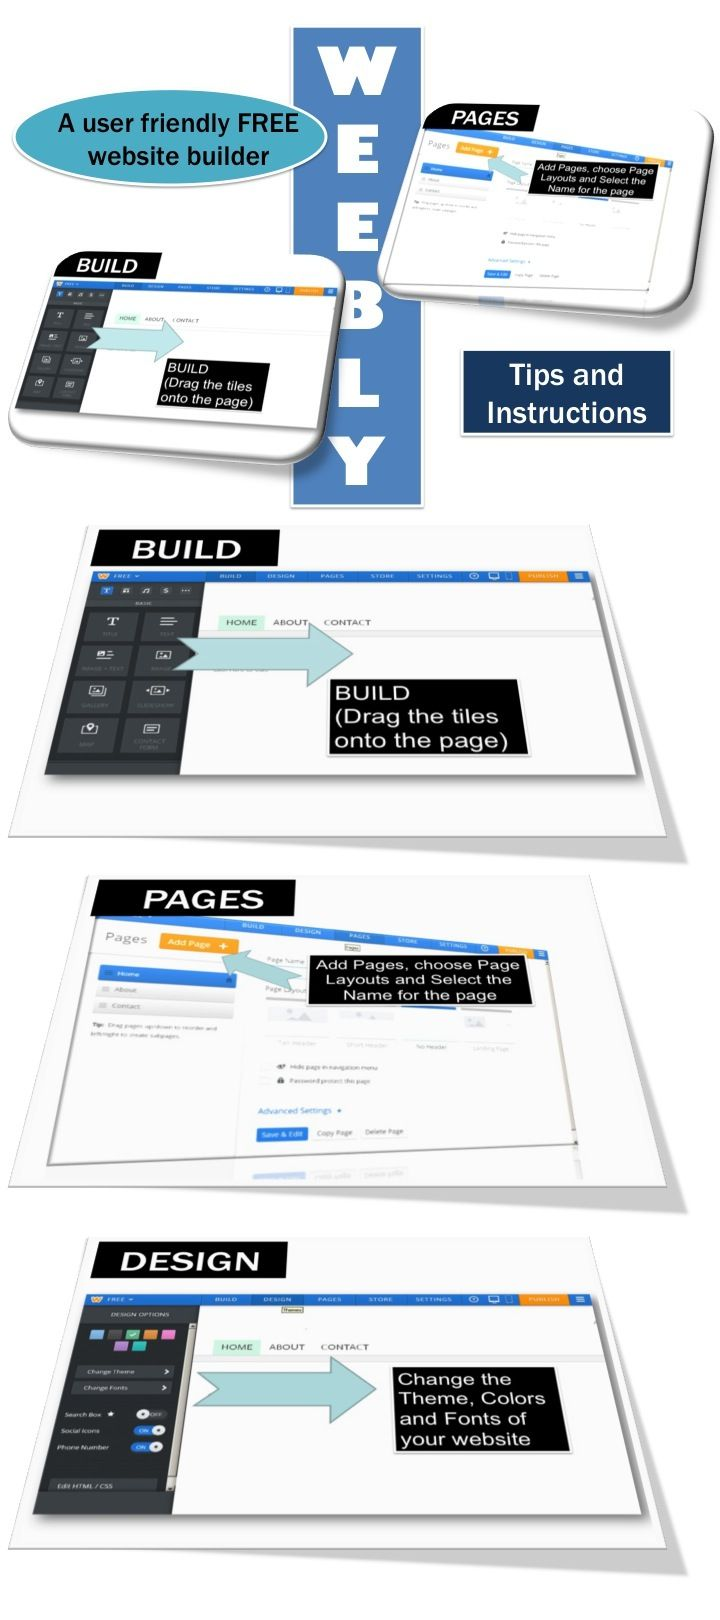 where can i build a free website